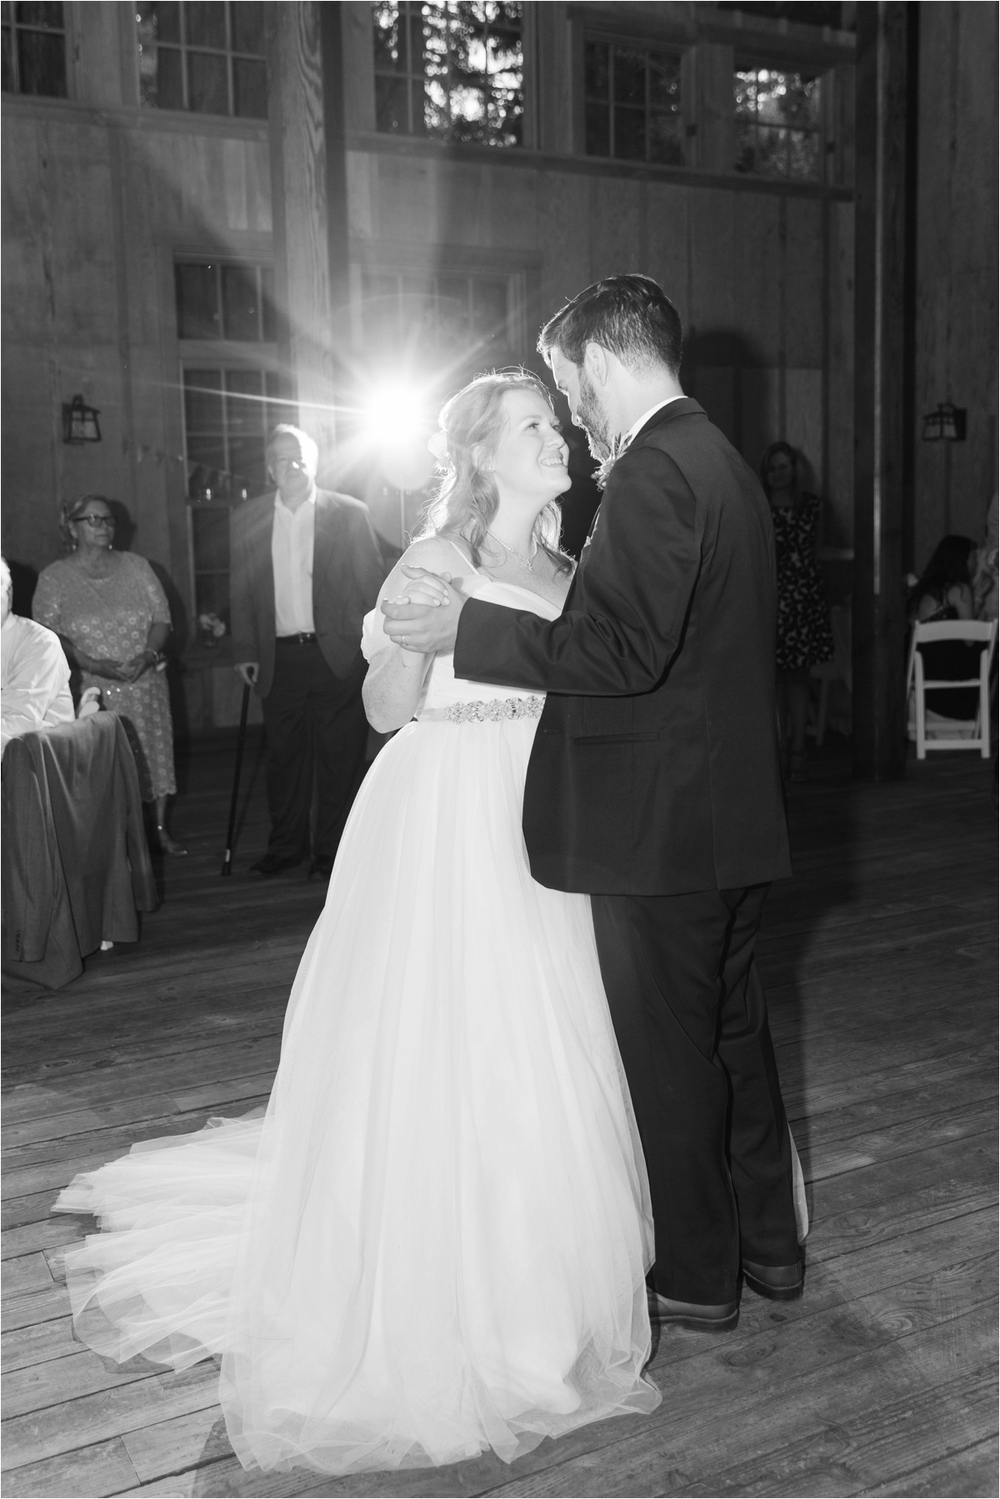 Nestldown wedding Photos by Briana Calderon Photography_0136.jpg